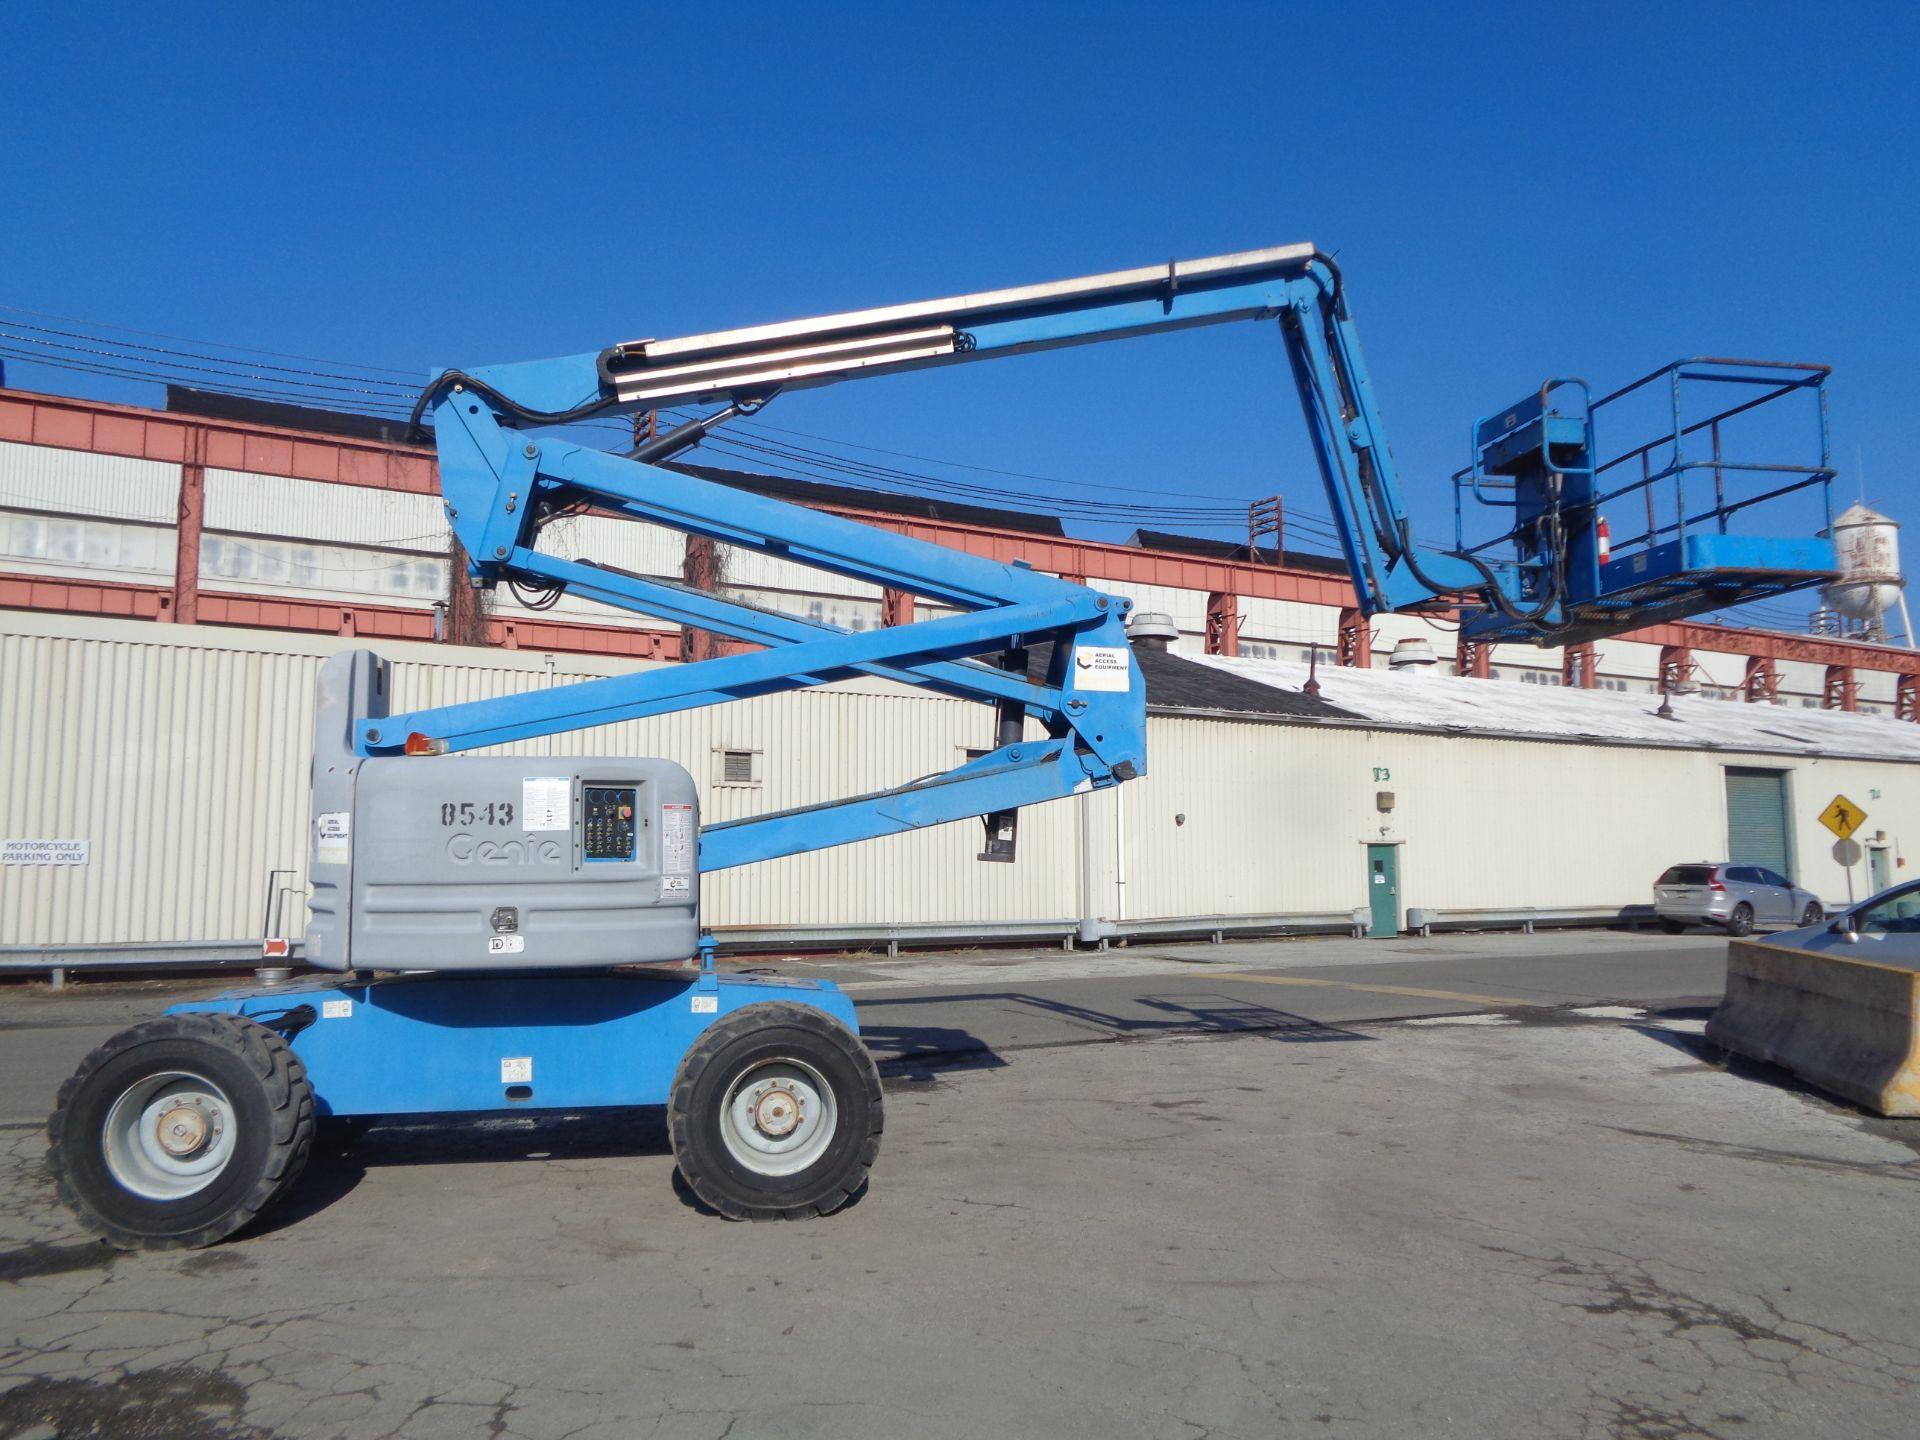 Lot 42 - 2007 Genie Z60/34 60FT Boom Lift